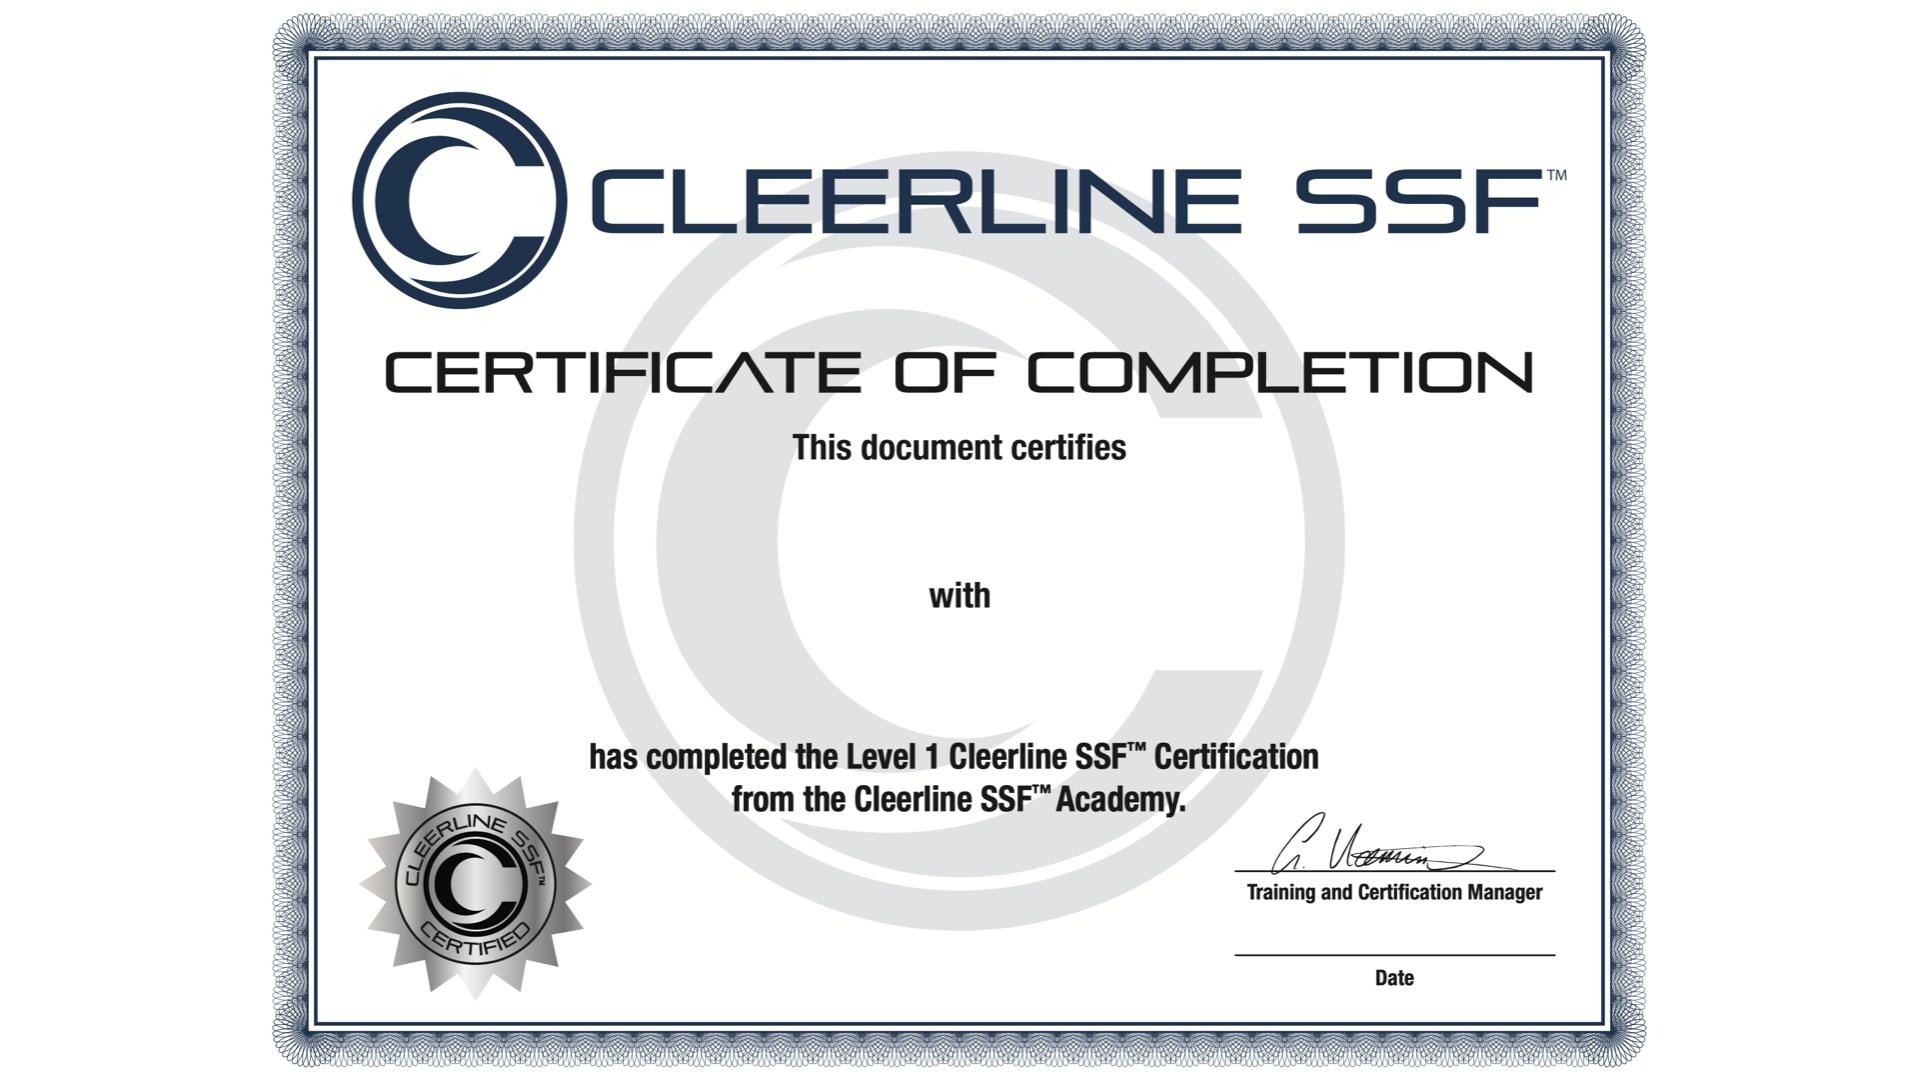 Level 1 Cleerline SSF™ Certification Assessment